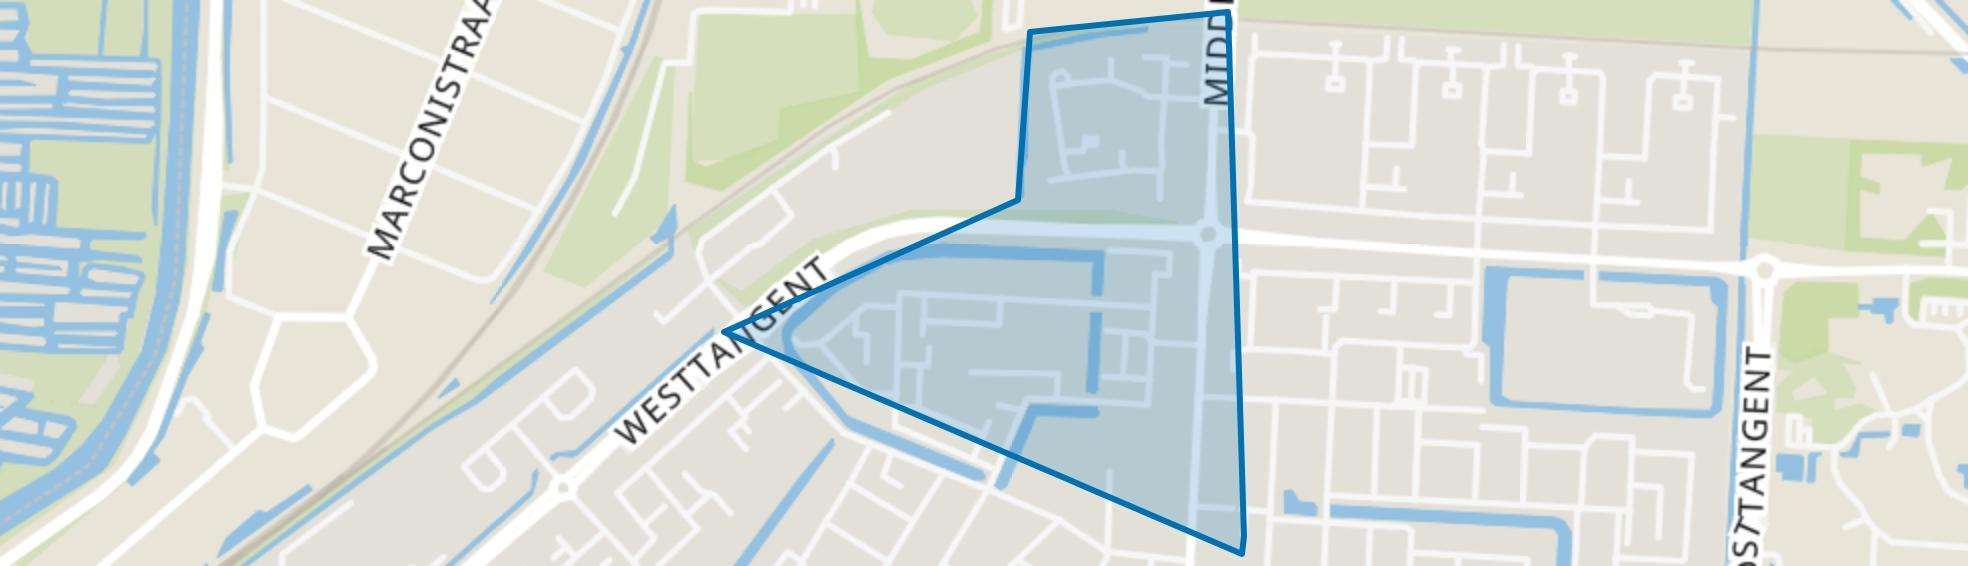 Heemradenbuurt, Heerhugowaard map